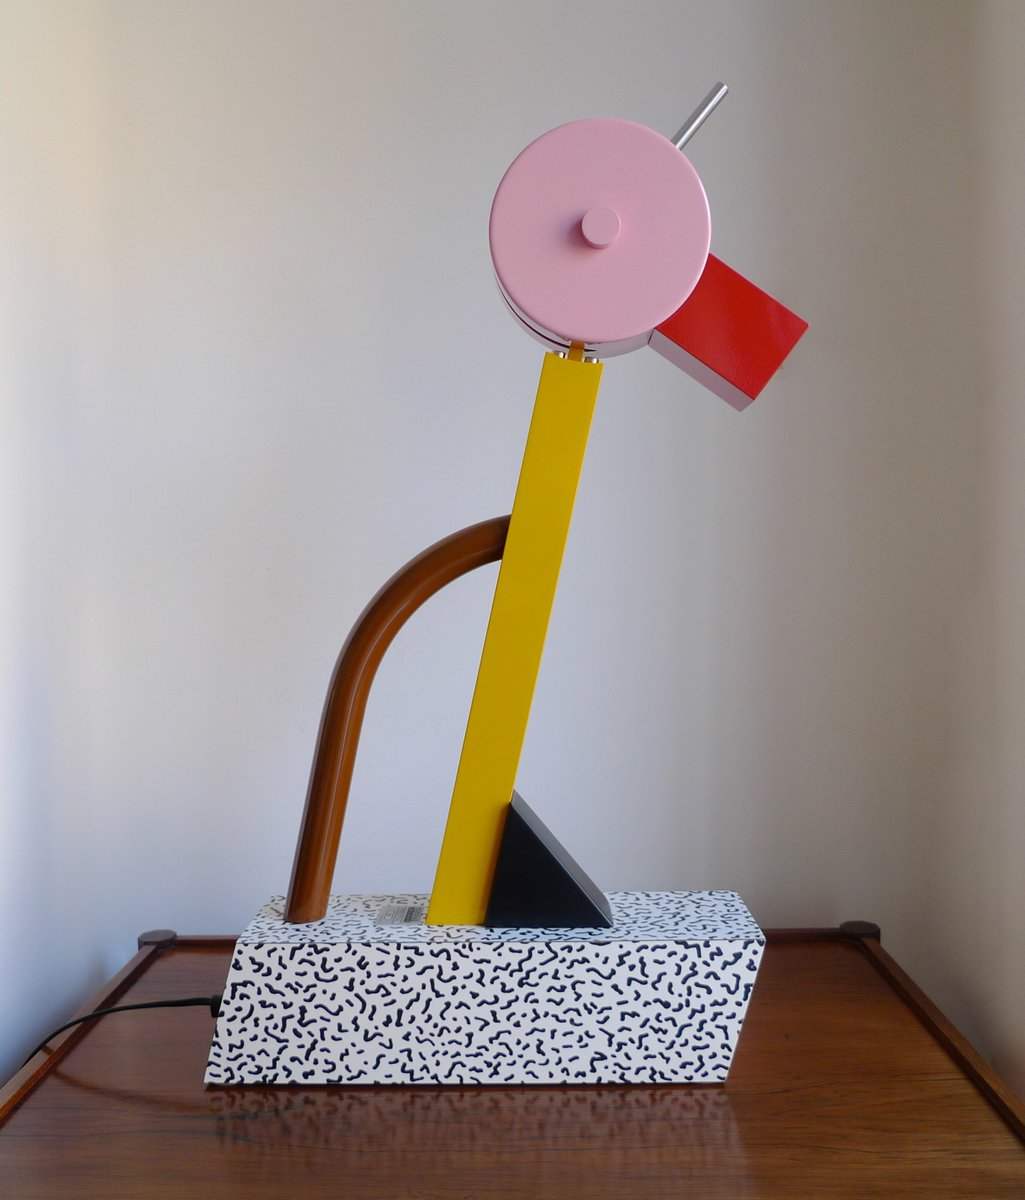 Tahiti Lampe von Ettore Sottsass für Memphis Group, 1981